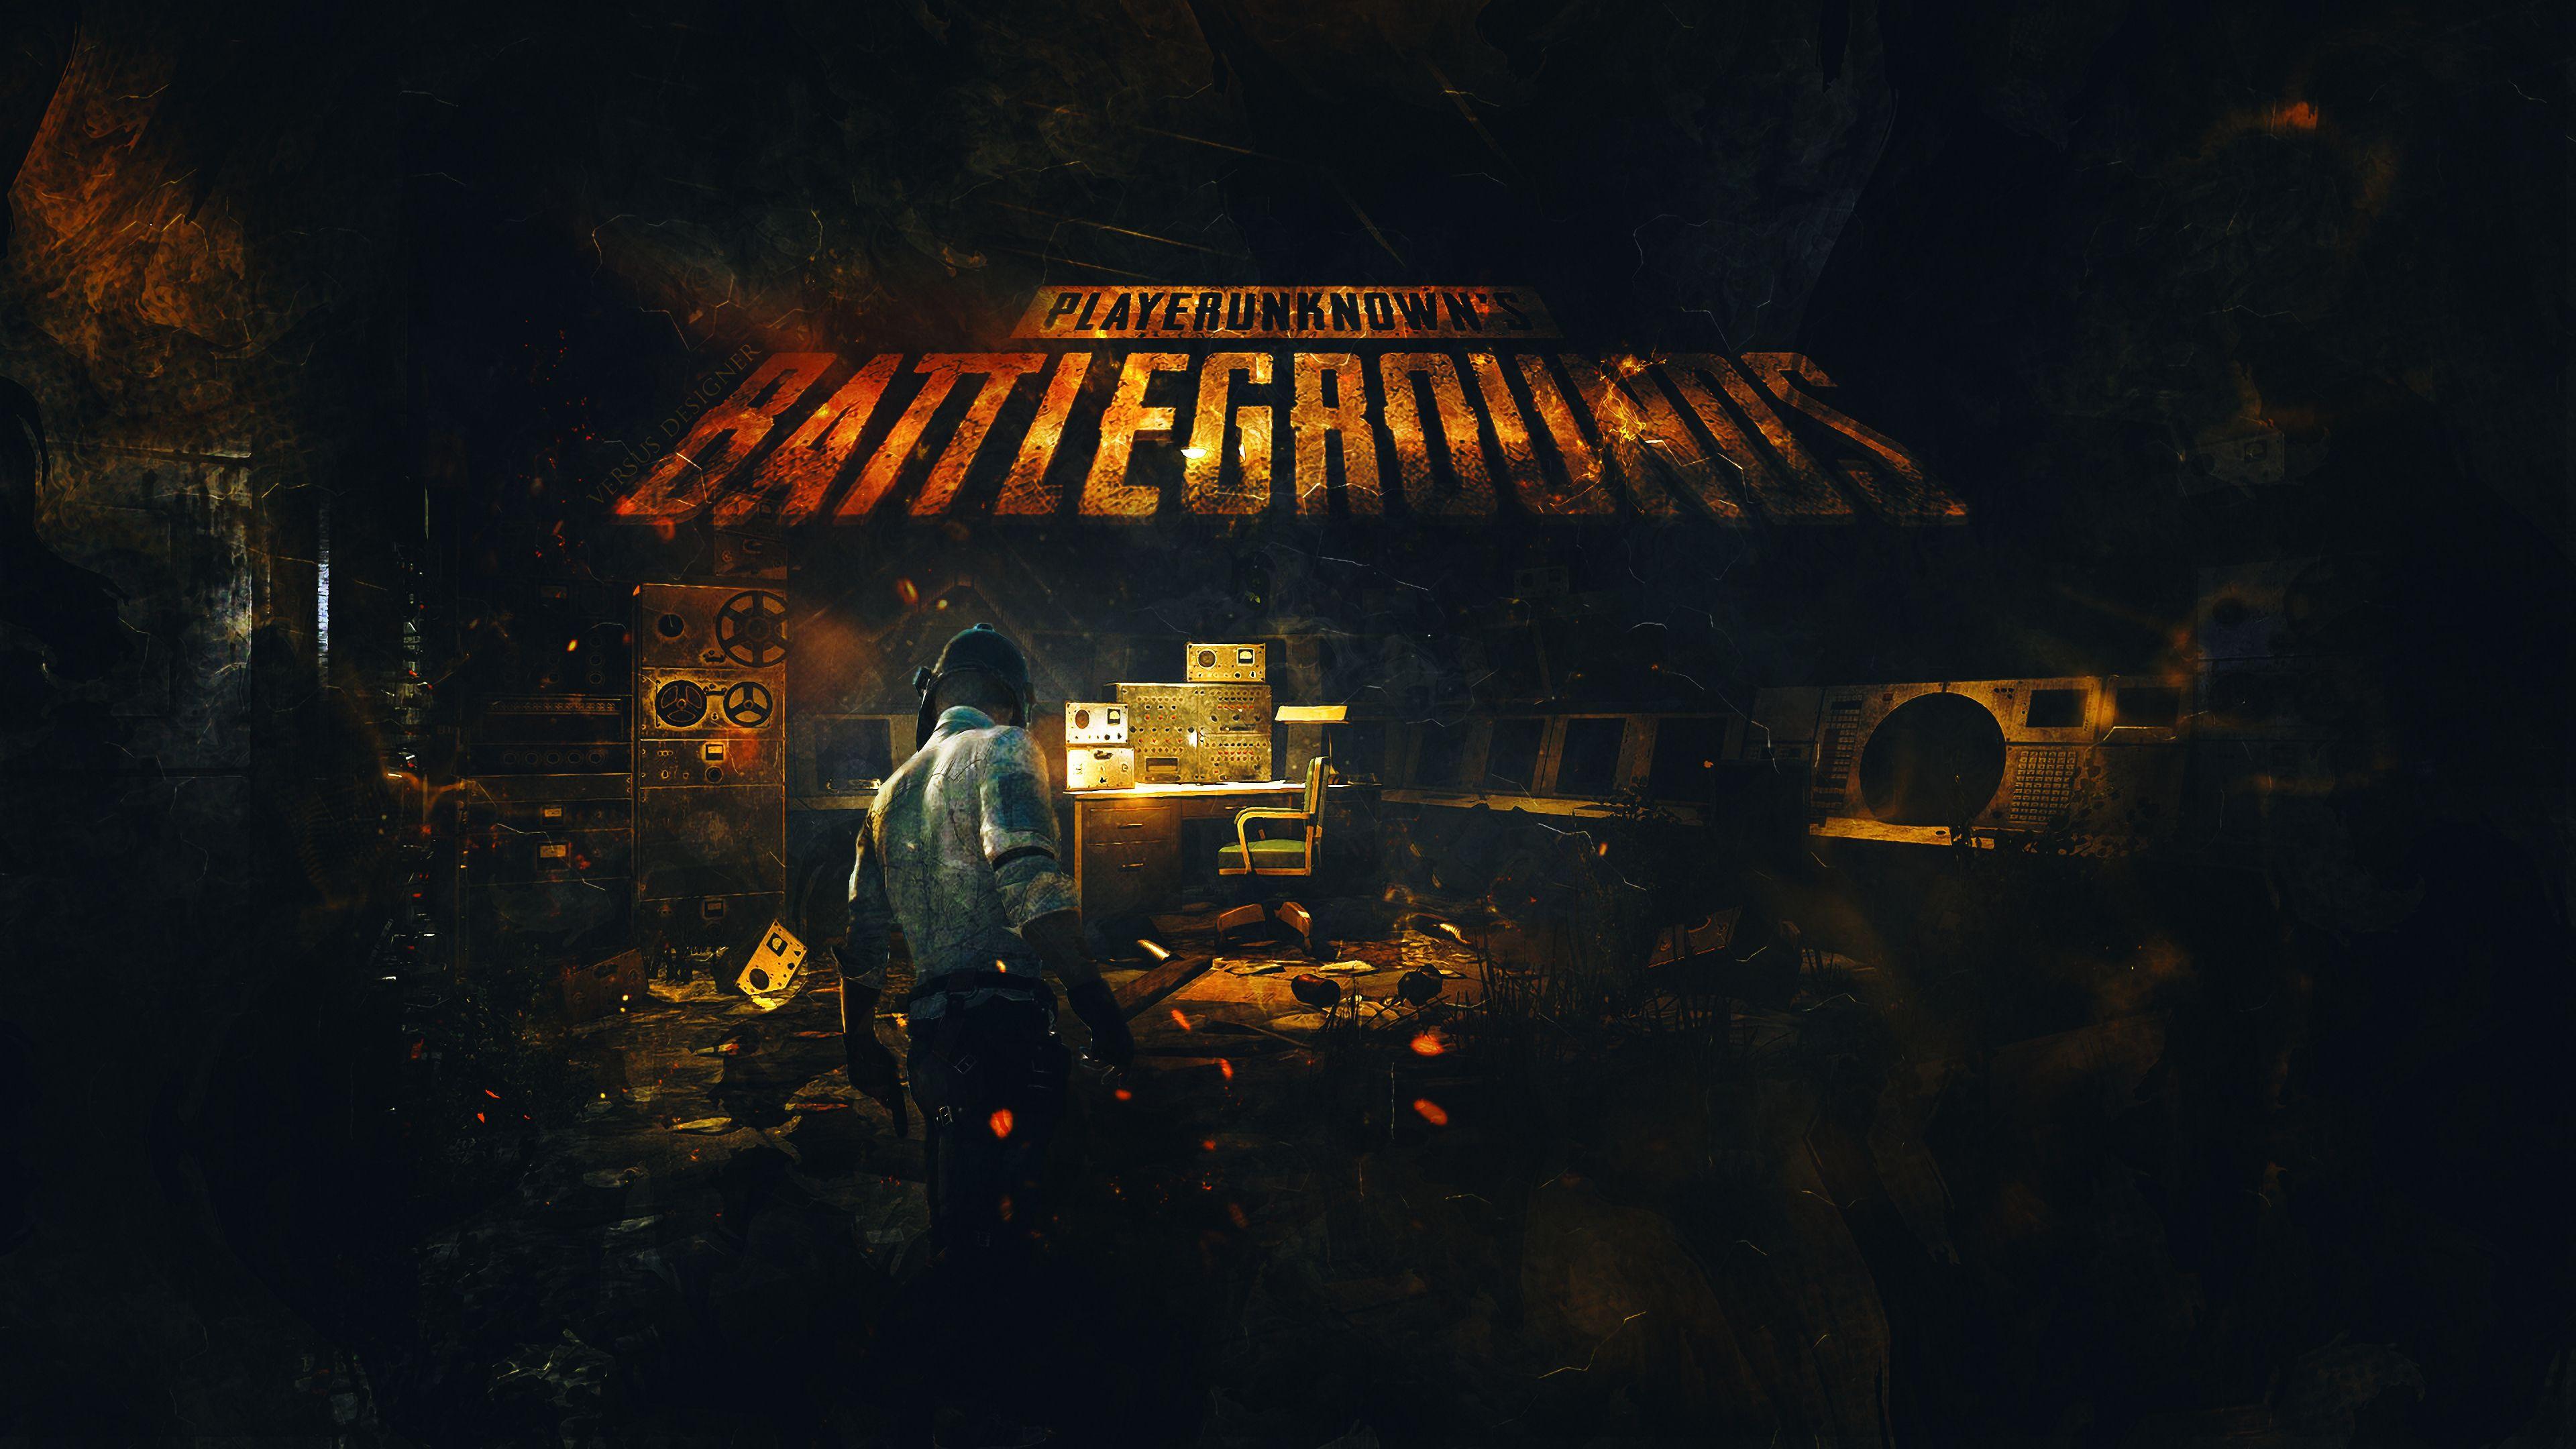 PlayerUnknowns Battlegrounds PUBG Wallpapers and Photos 3840x2160